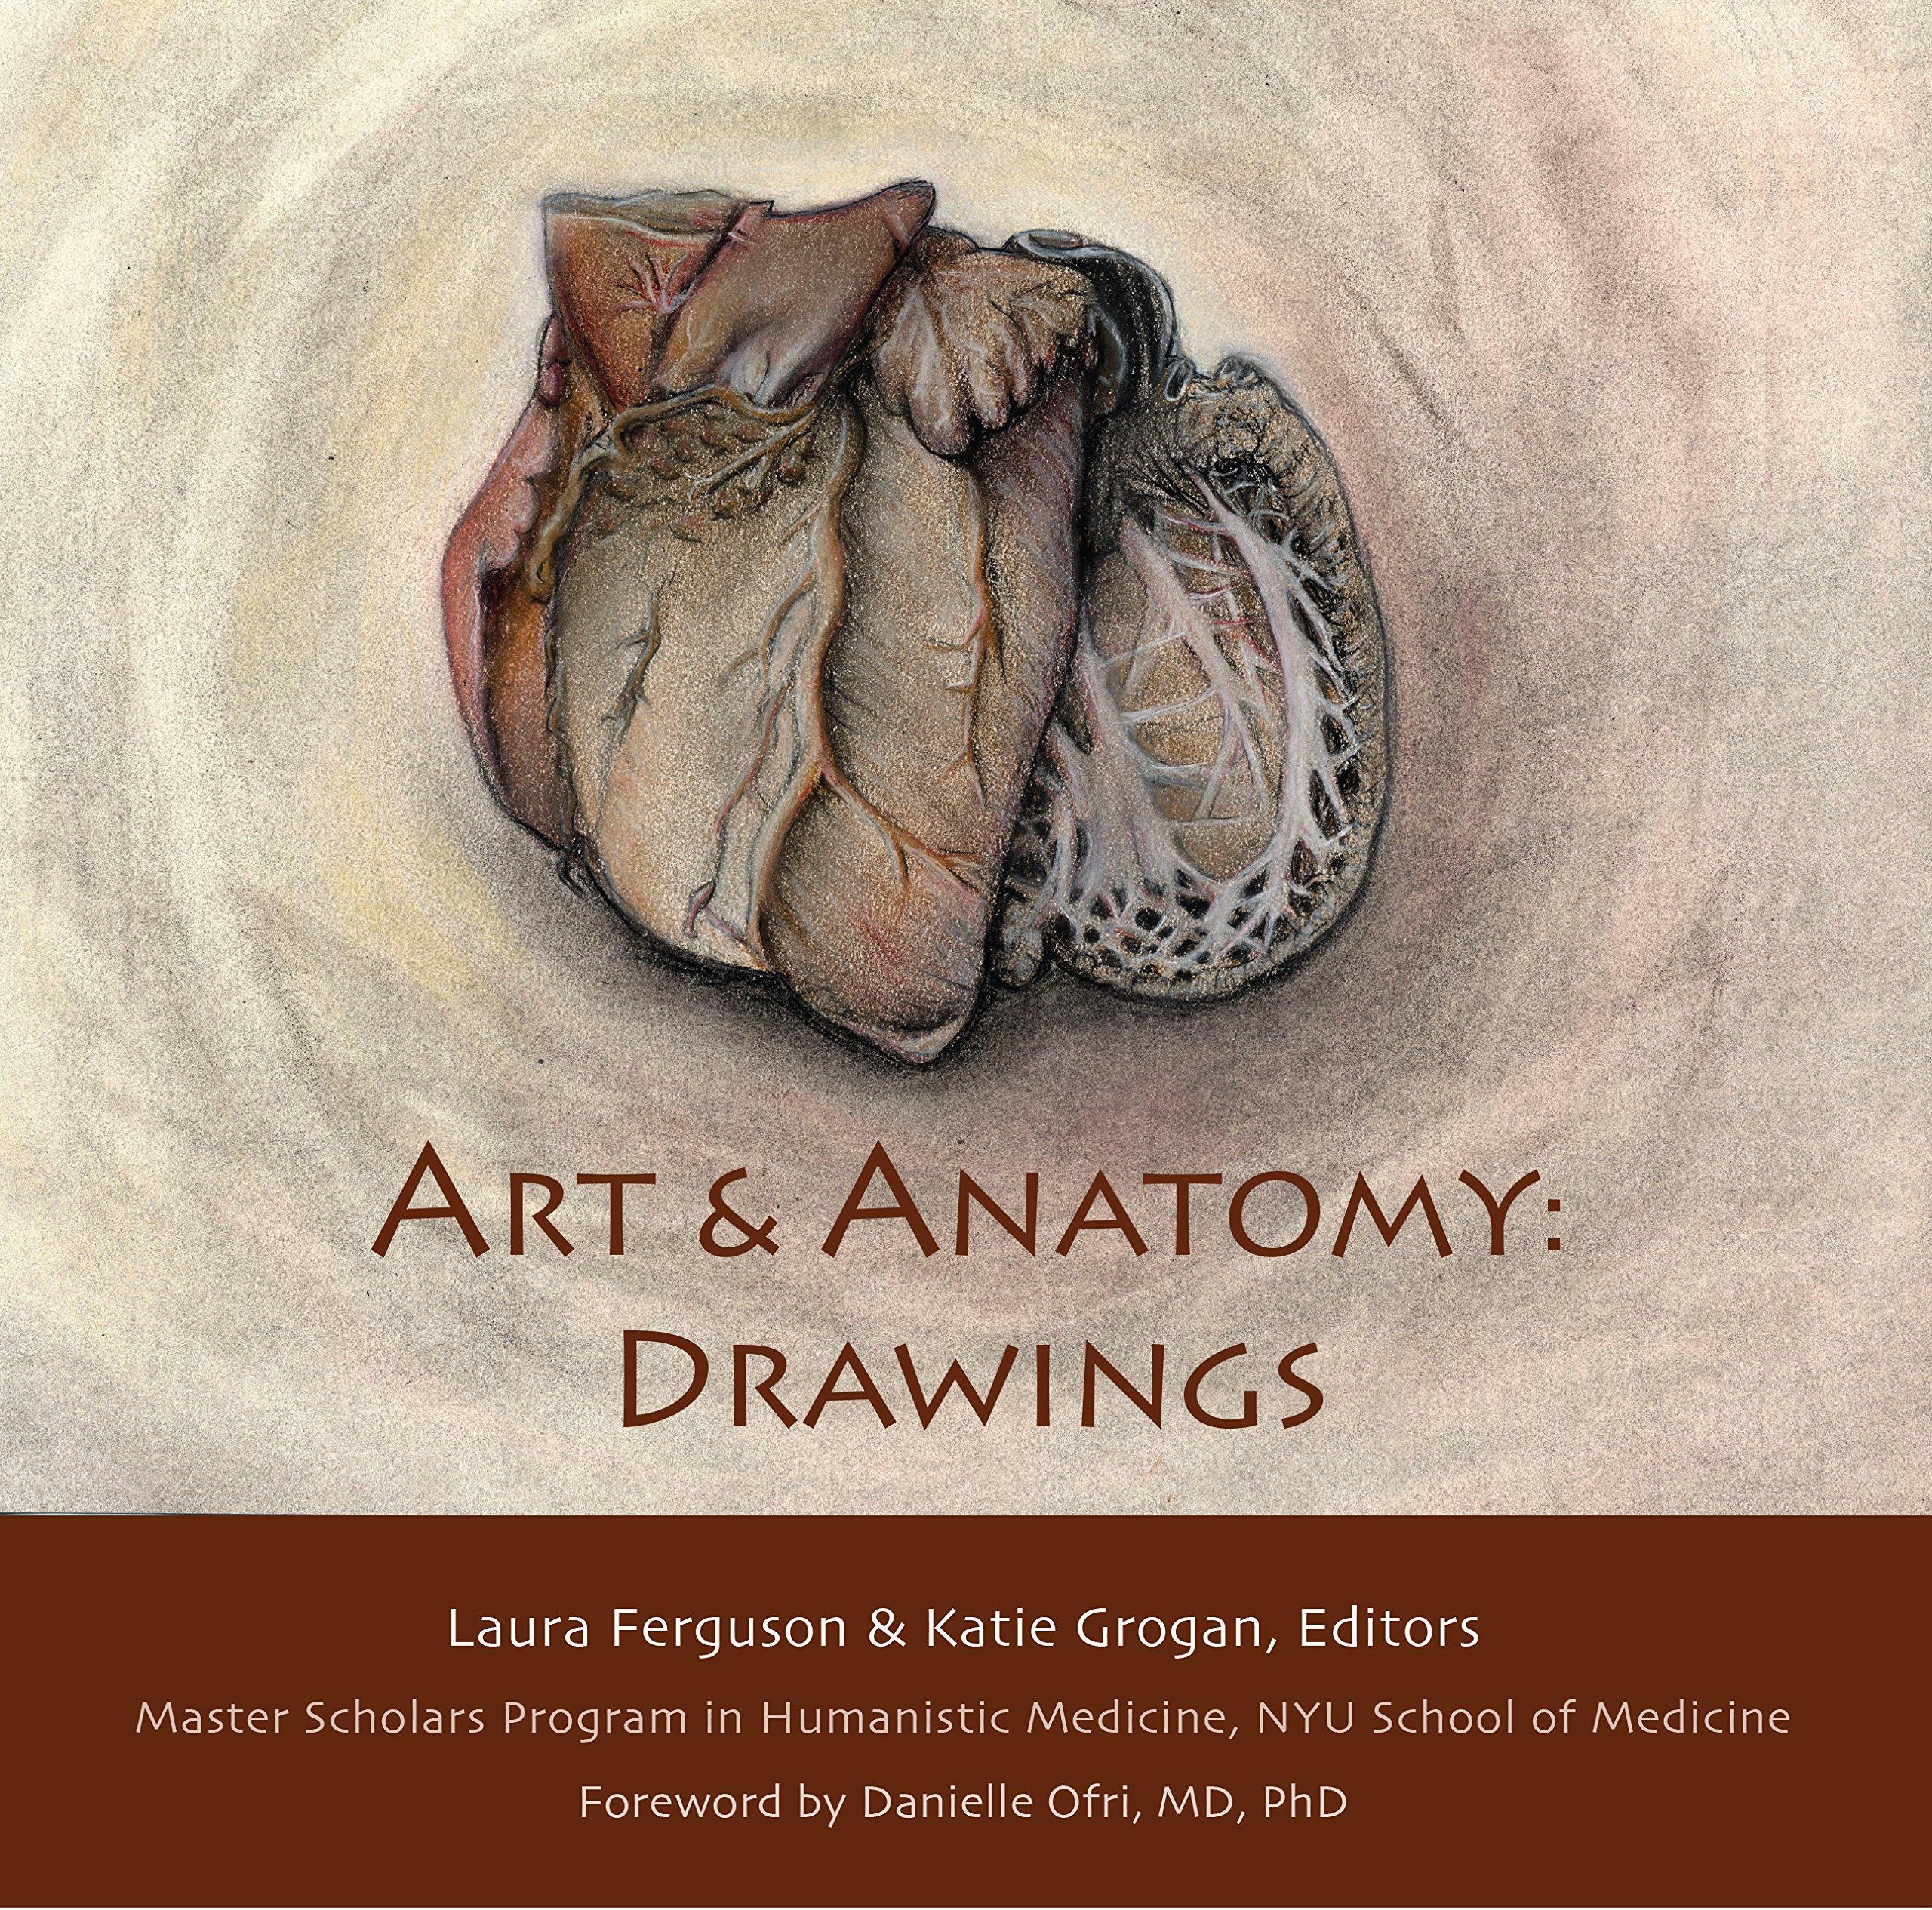 Art & Anatomy: Drawings: Laura Ferguson, Katie Grogan